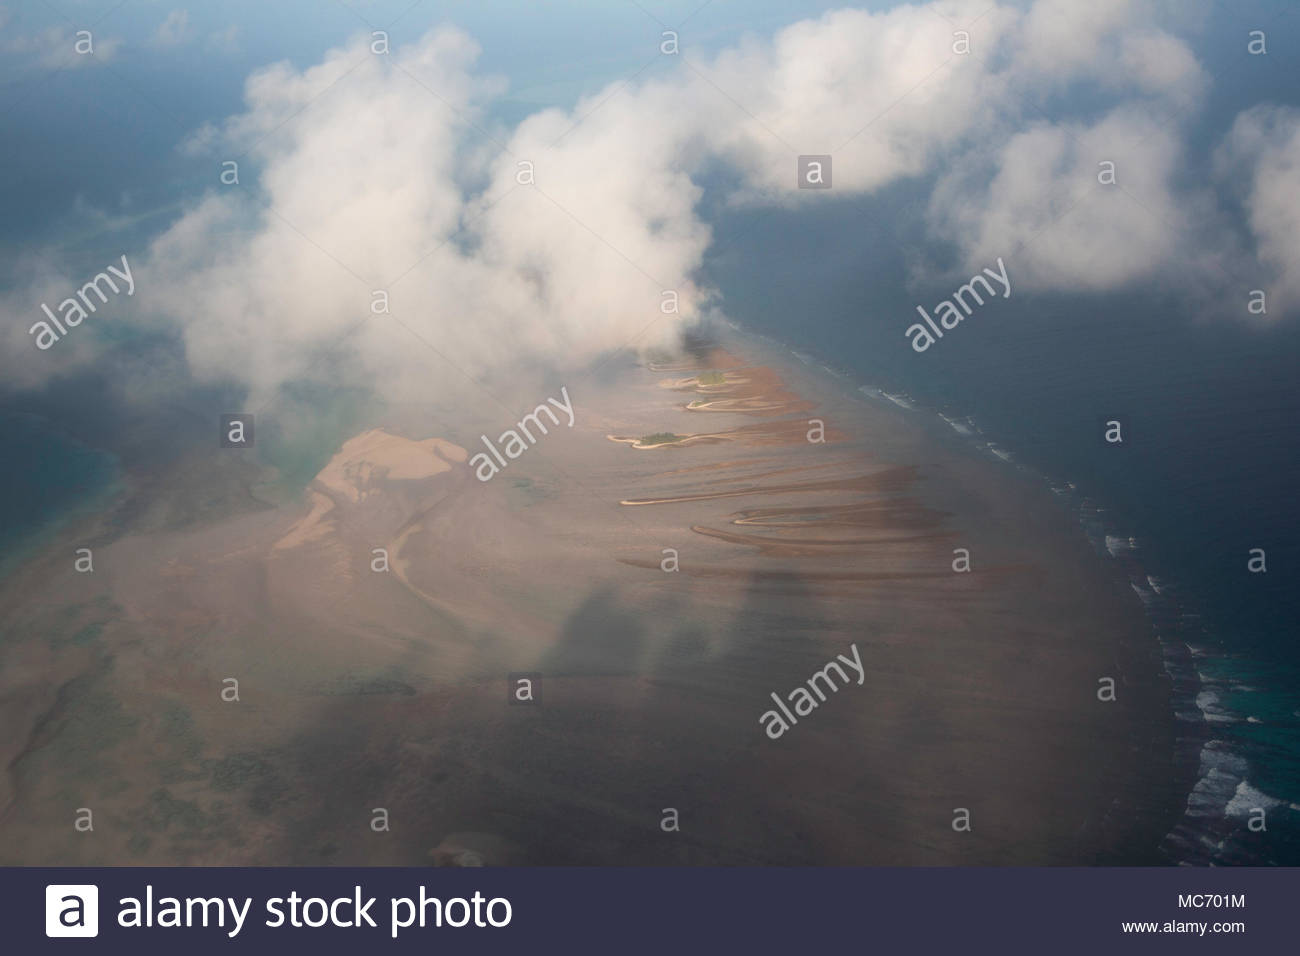 Aerial partial view of Tarawa atoll, Kiribati - Stock Image